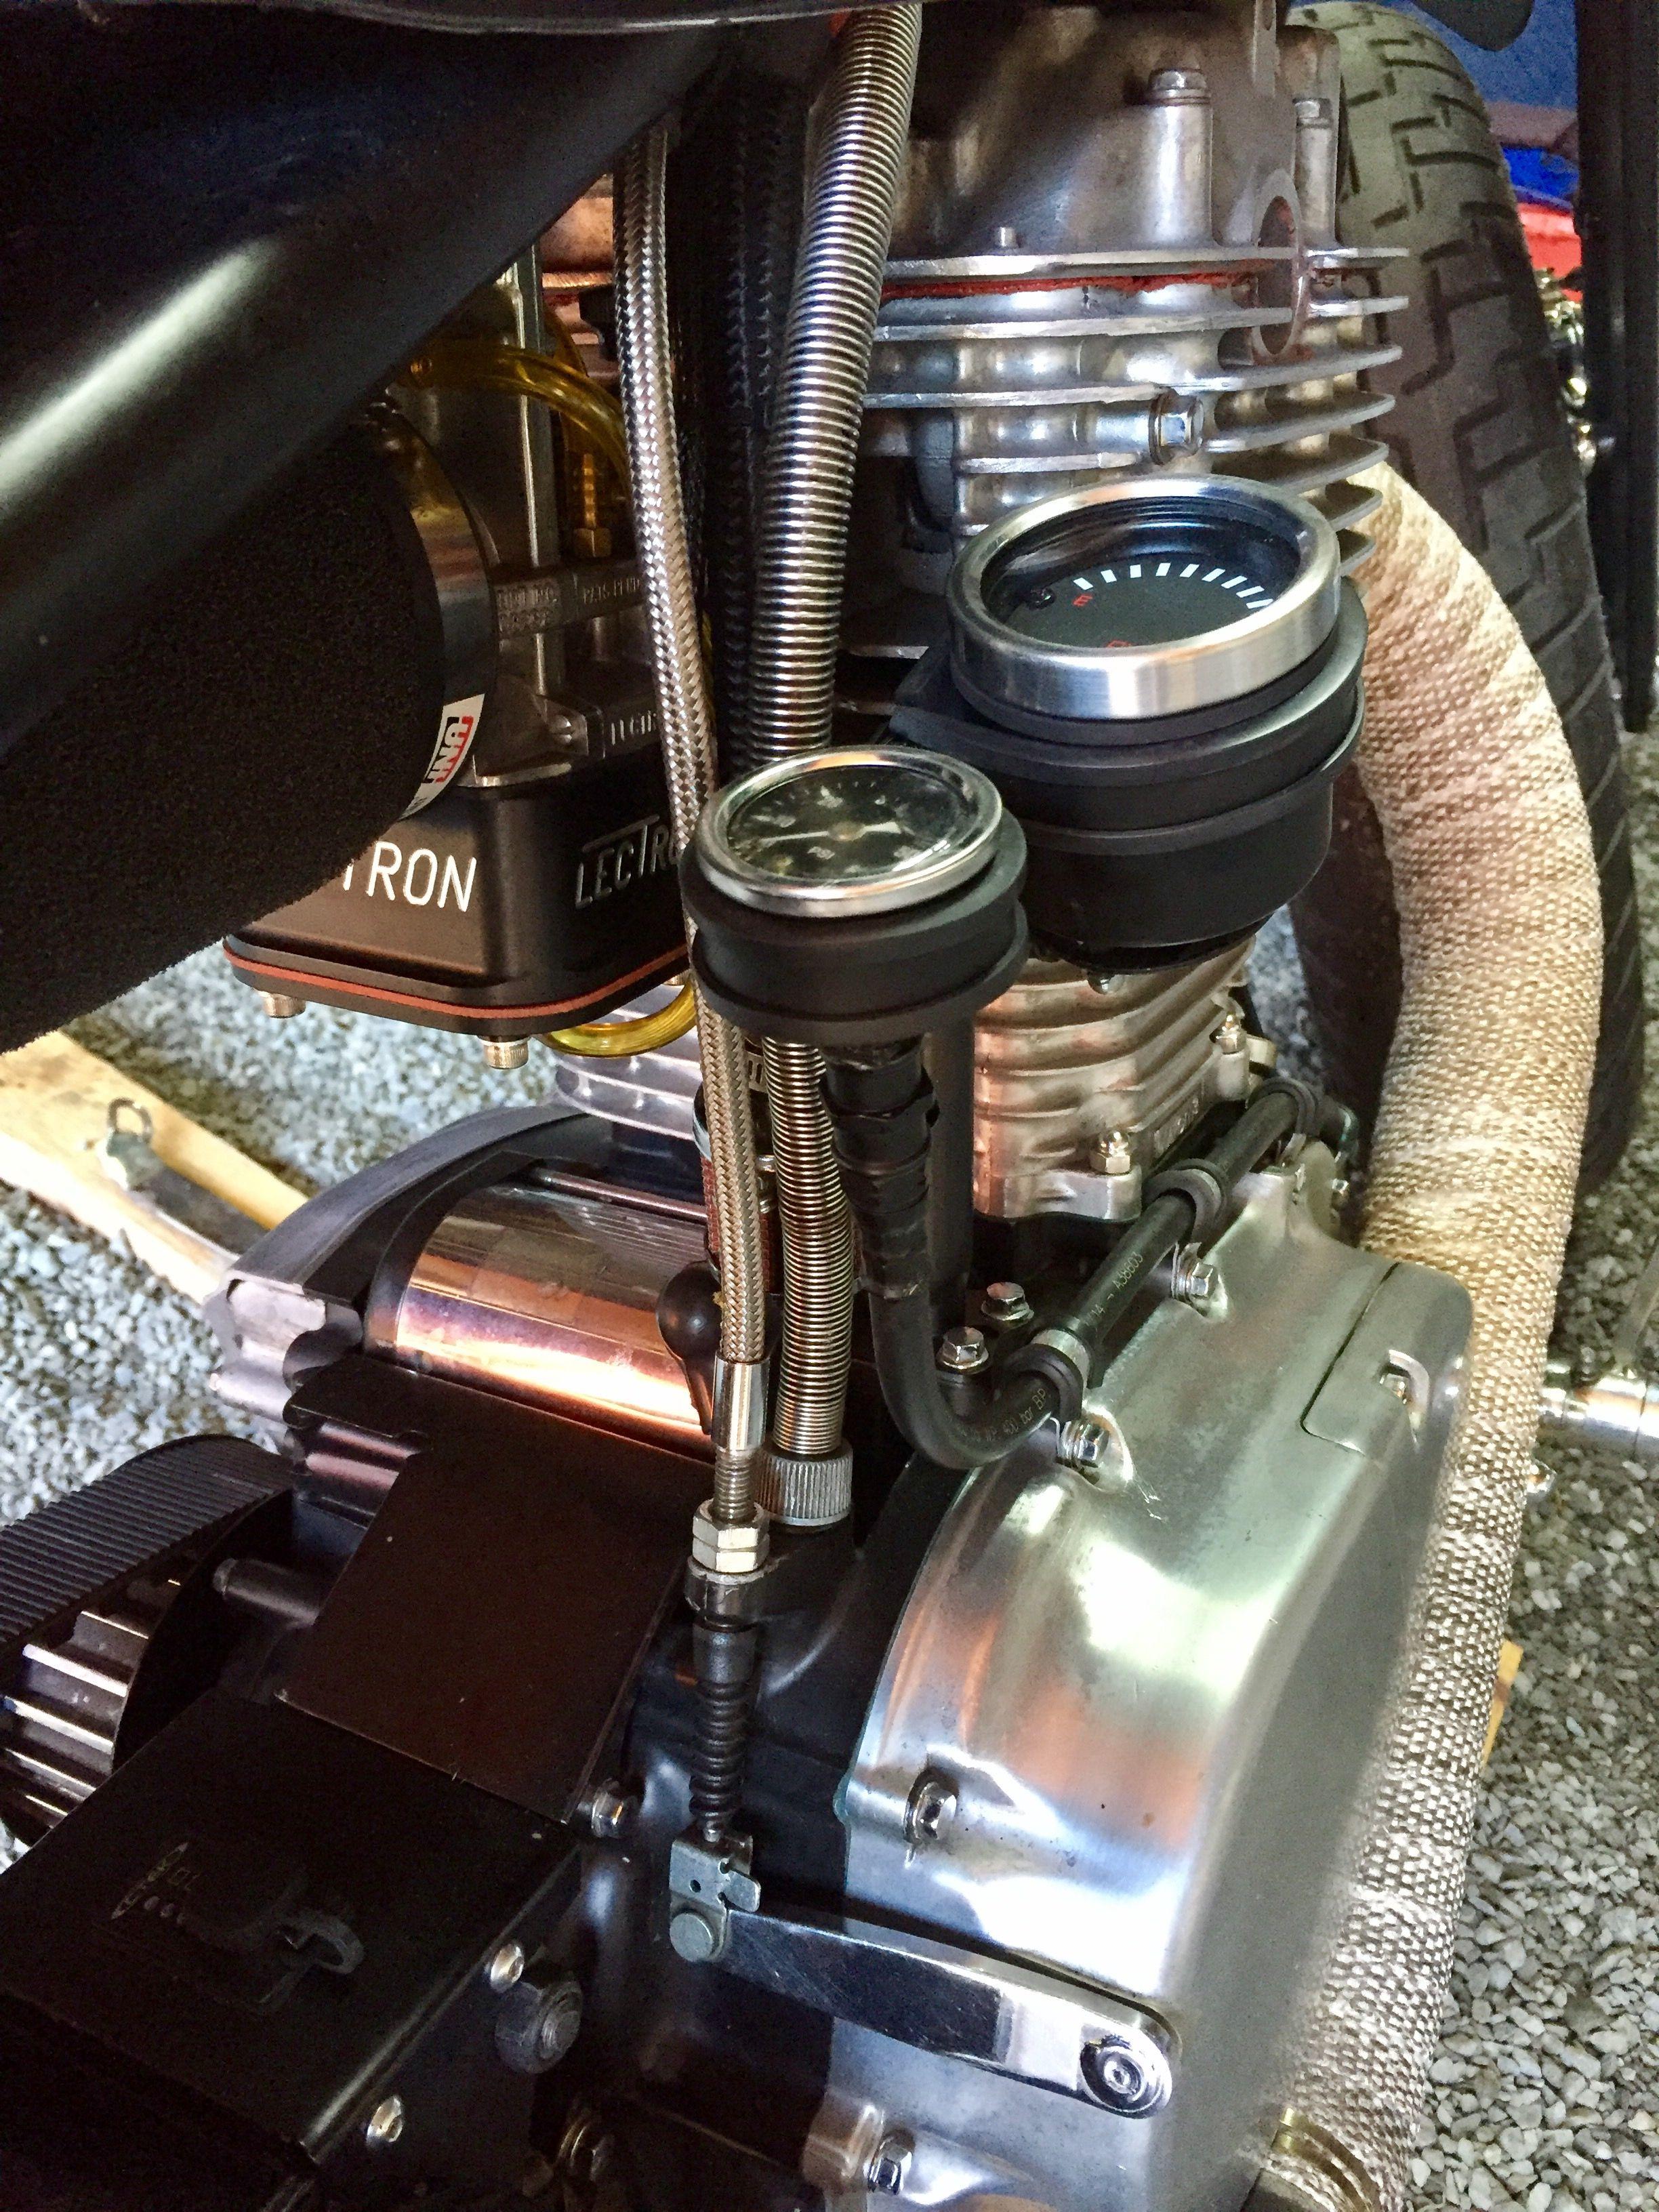 Suzuki Savage 666cc.  Oil pressure and gasoline gauge. Lectron 38mm carburetor.